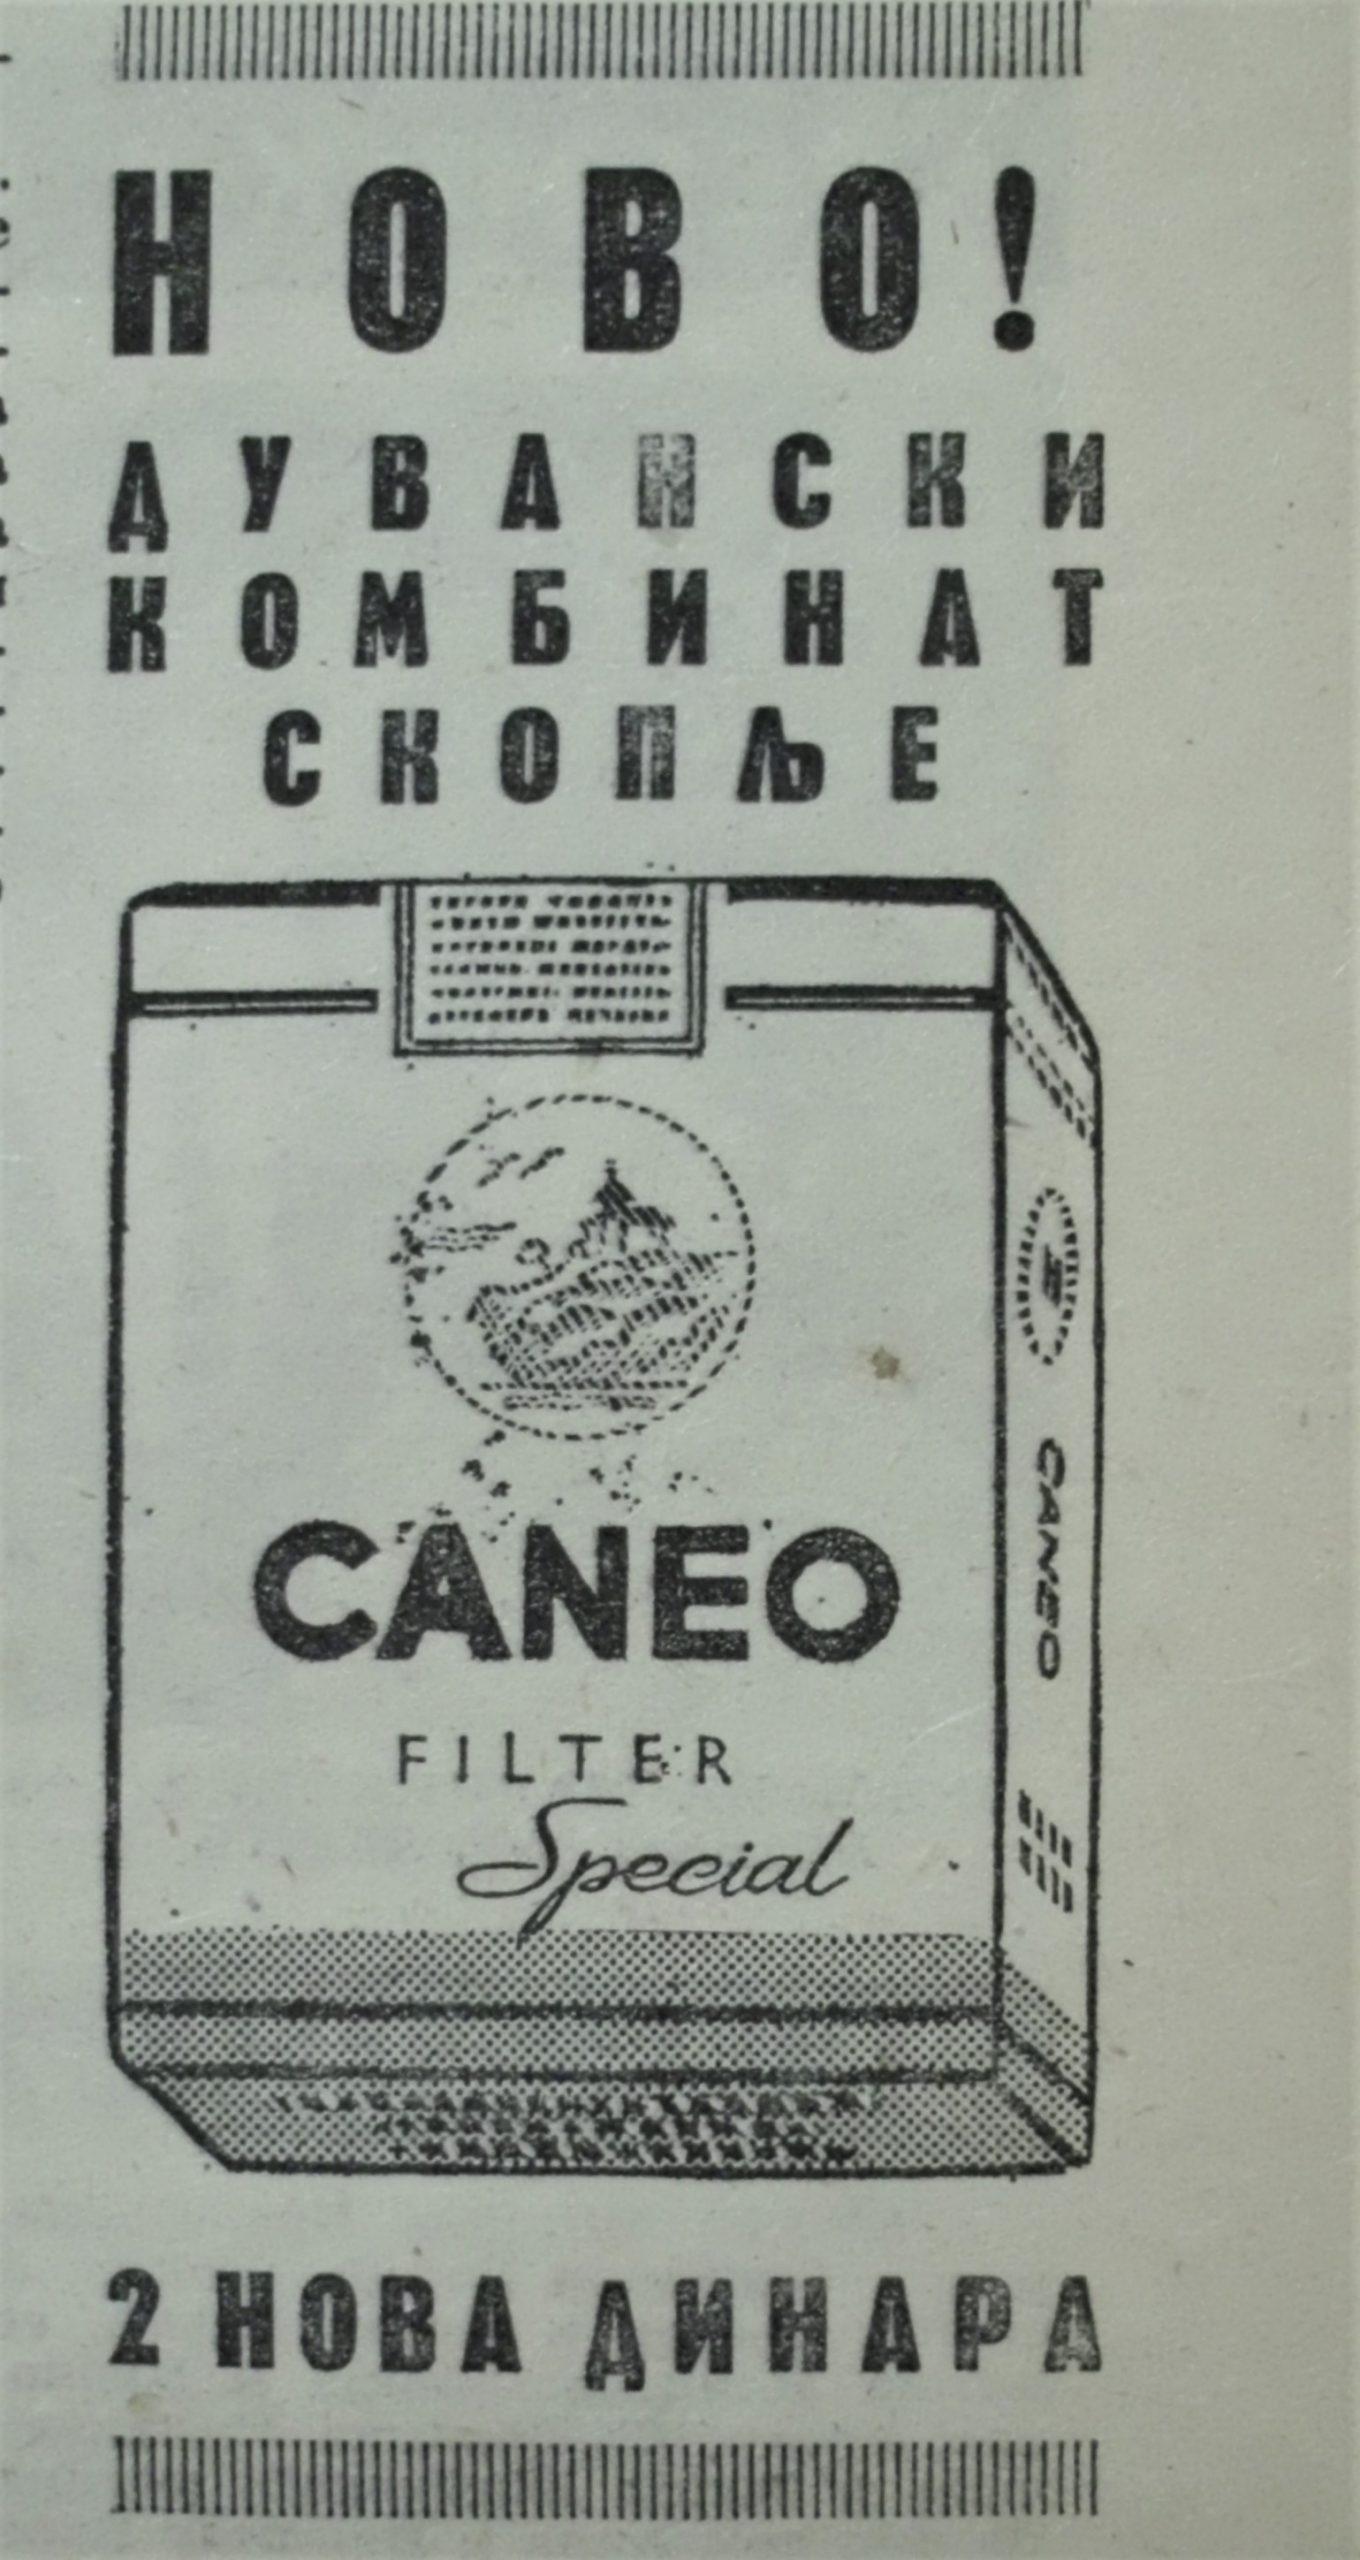 Cigare Caneo